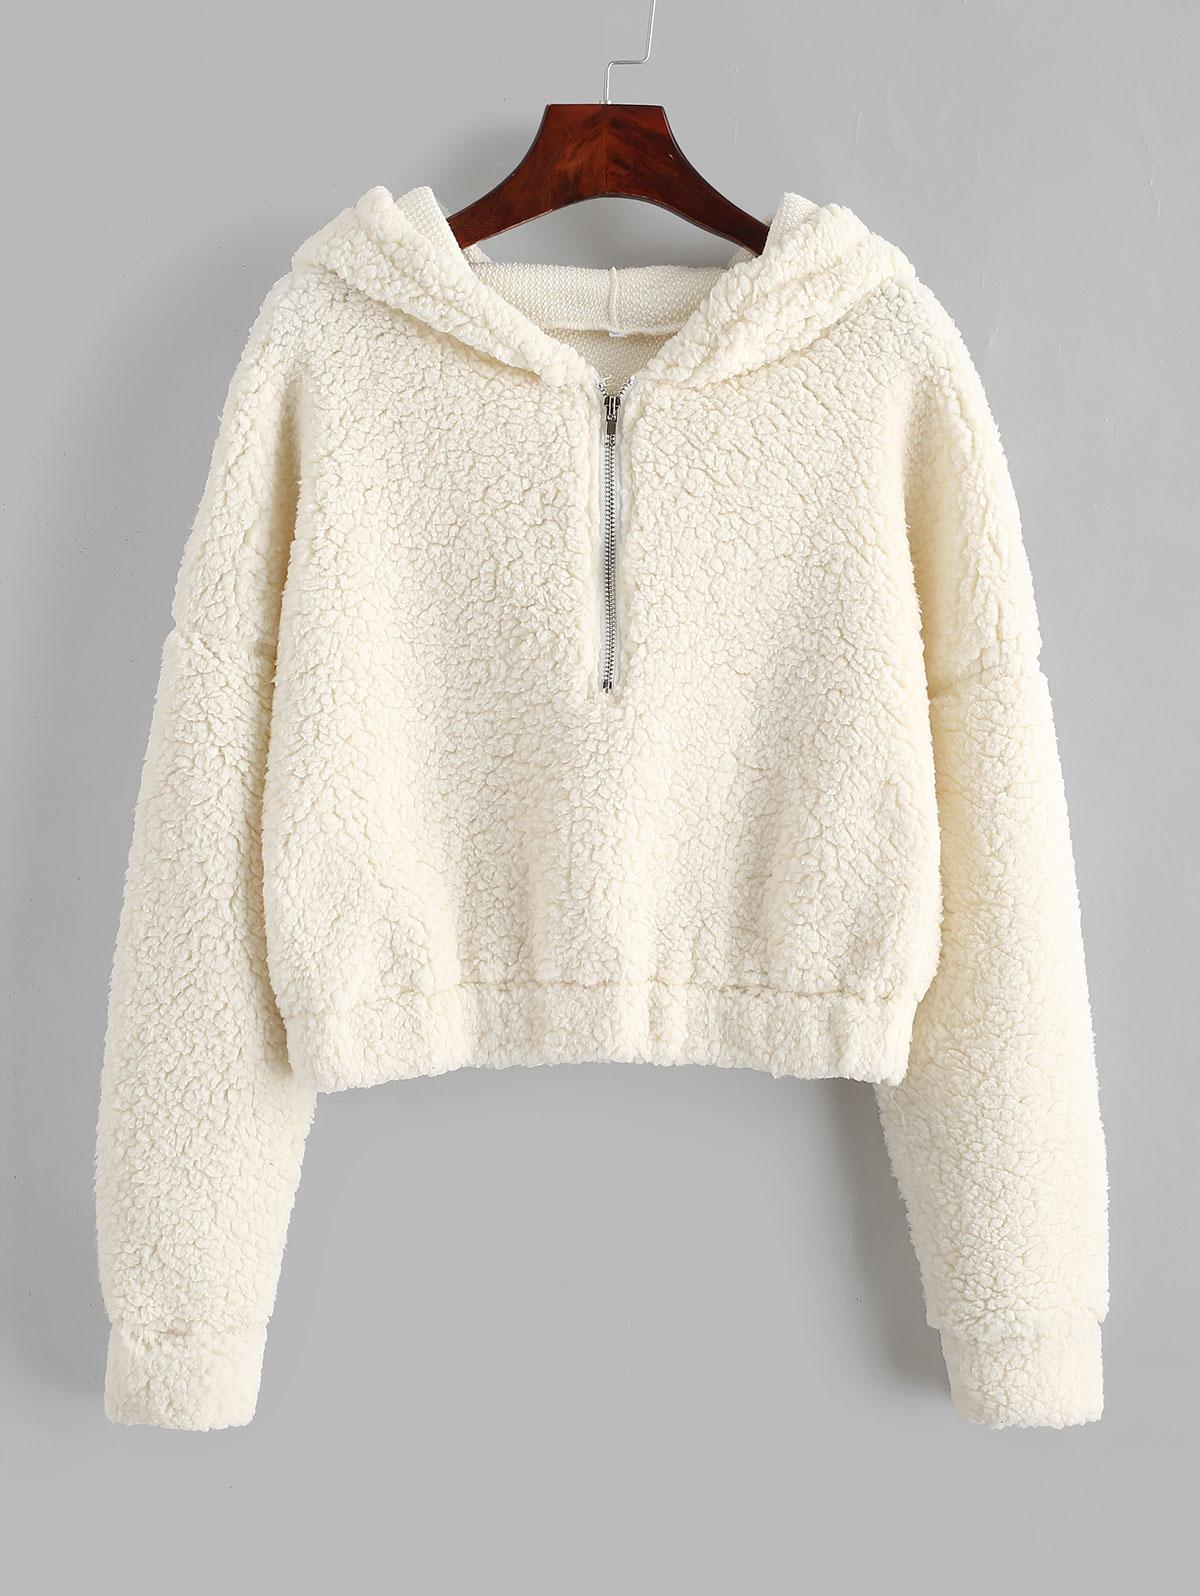 White Teddy Zip Up Sweatshirt